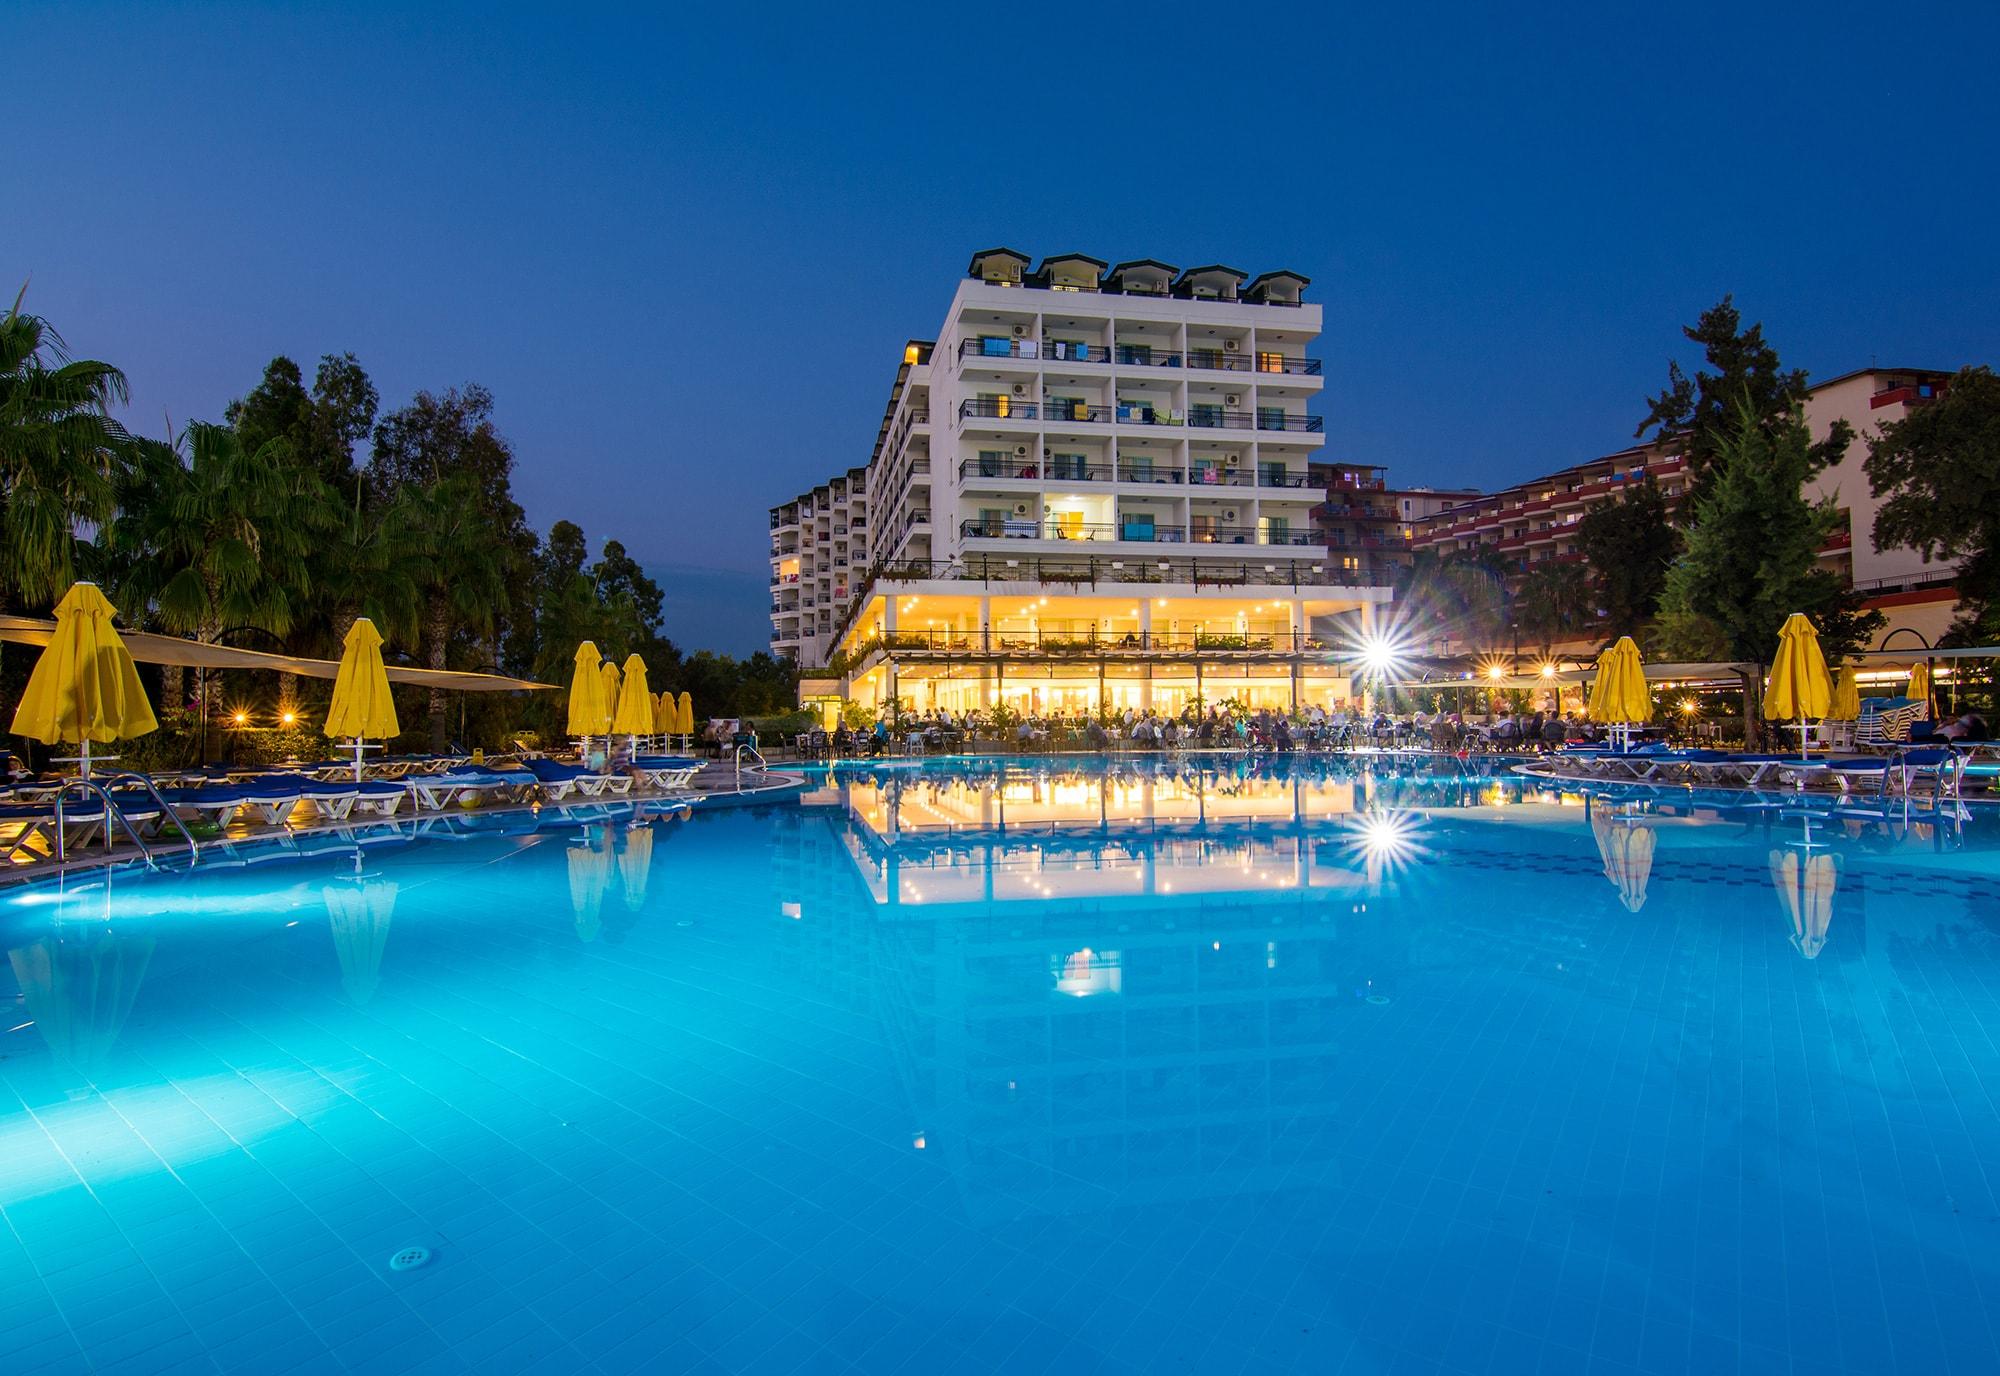 PERRE DELTA HOTEL